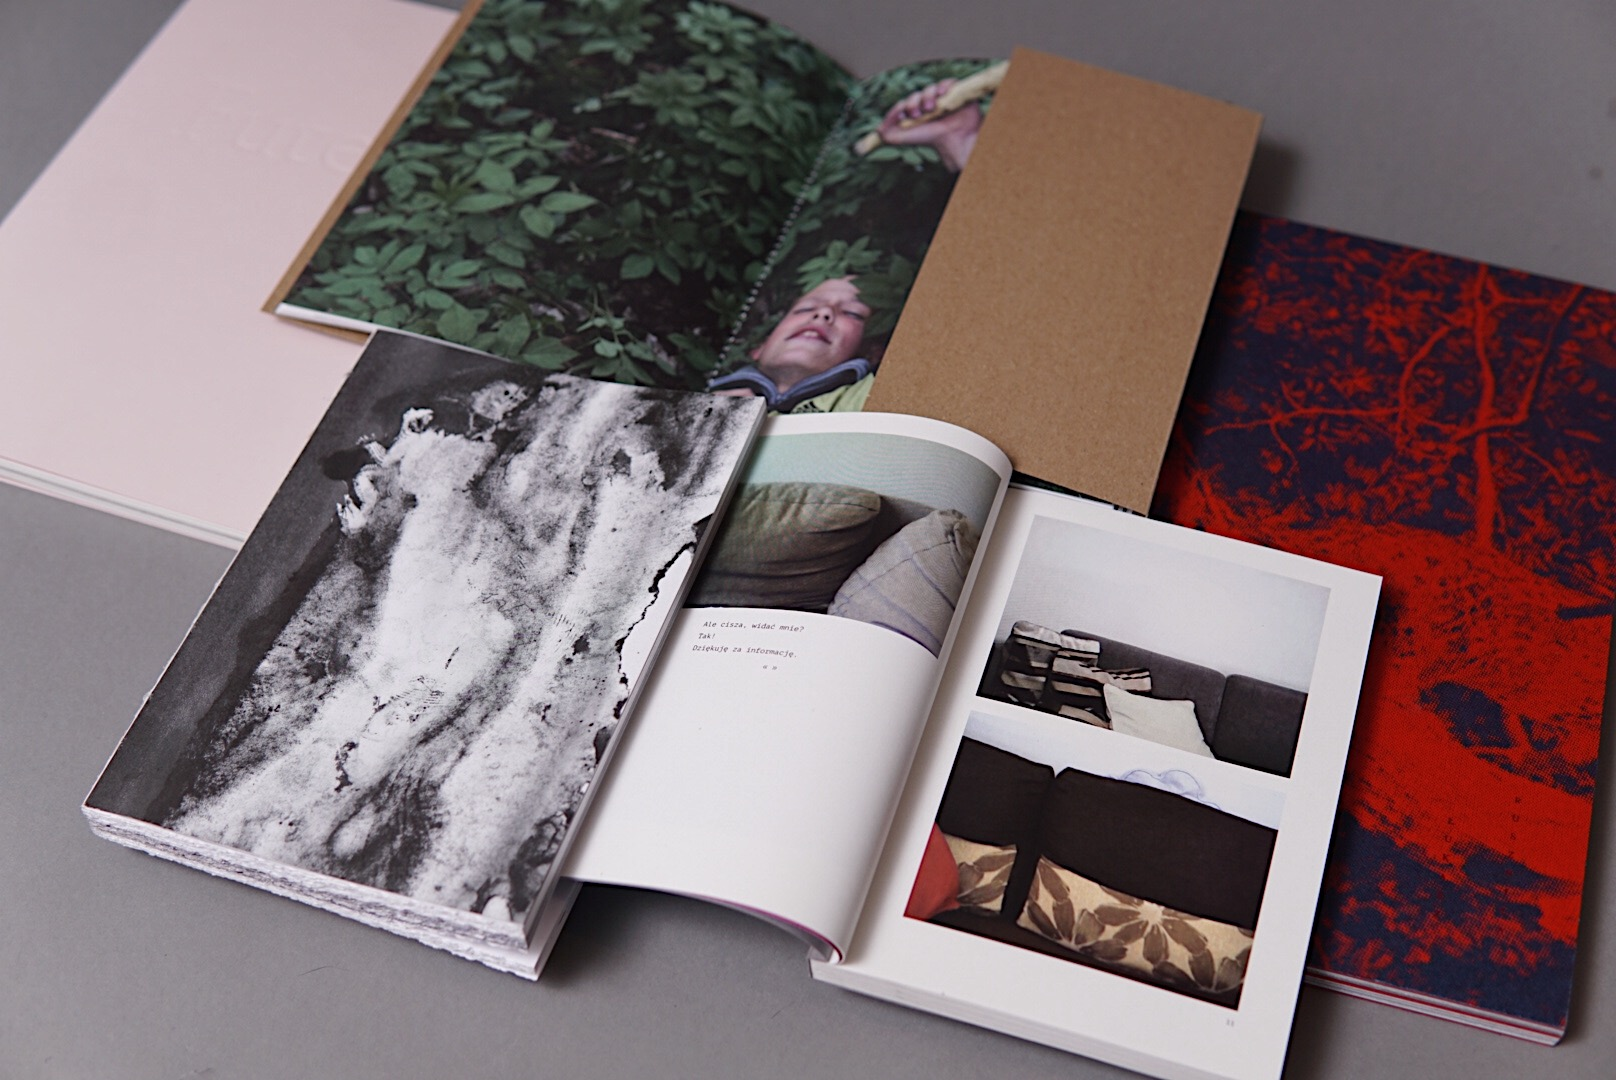 Z miłości do papieru – PAPERLUST Photobook Fest